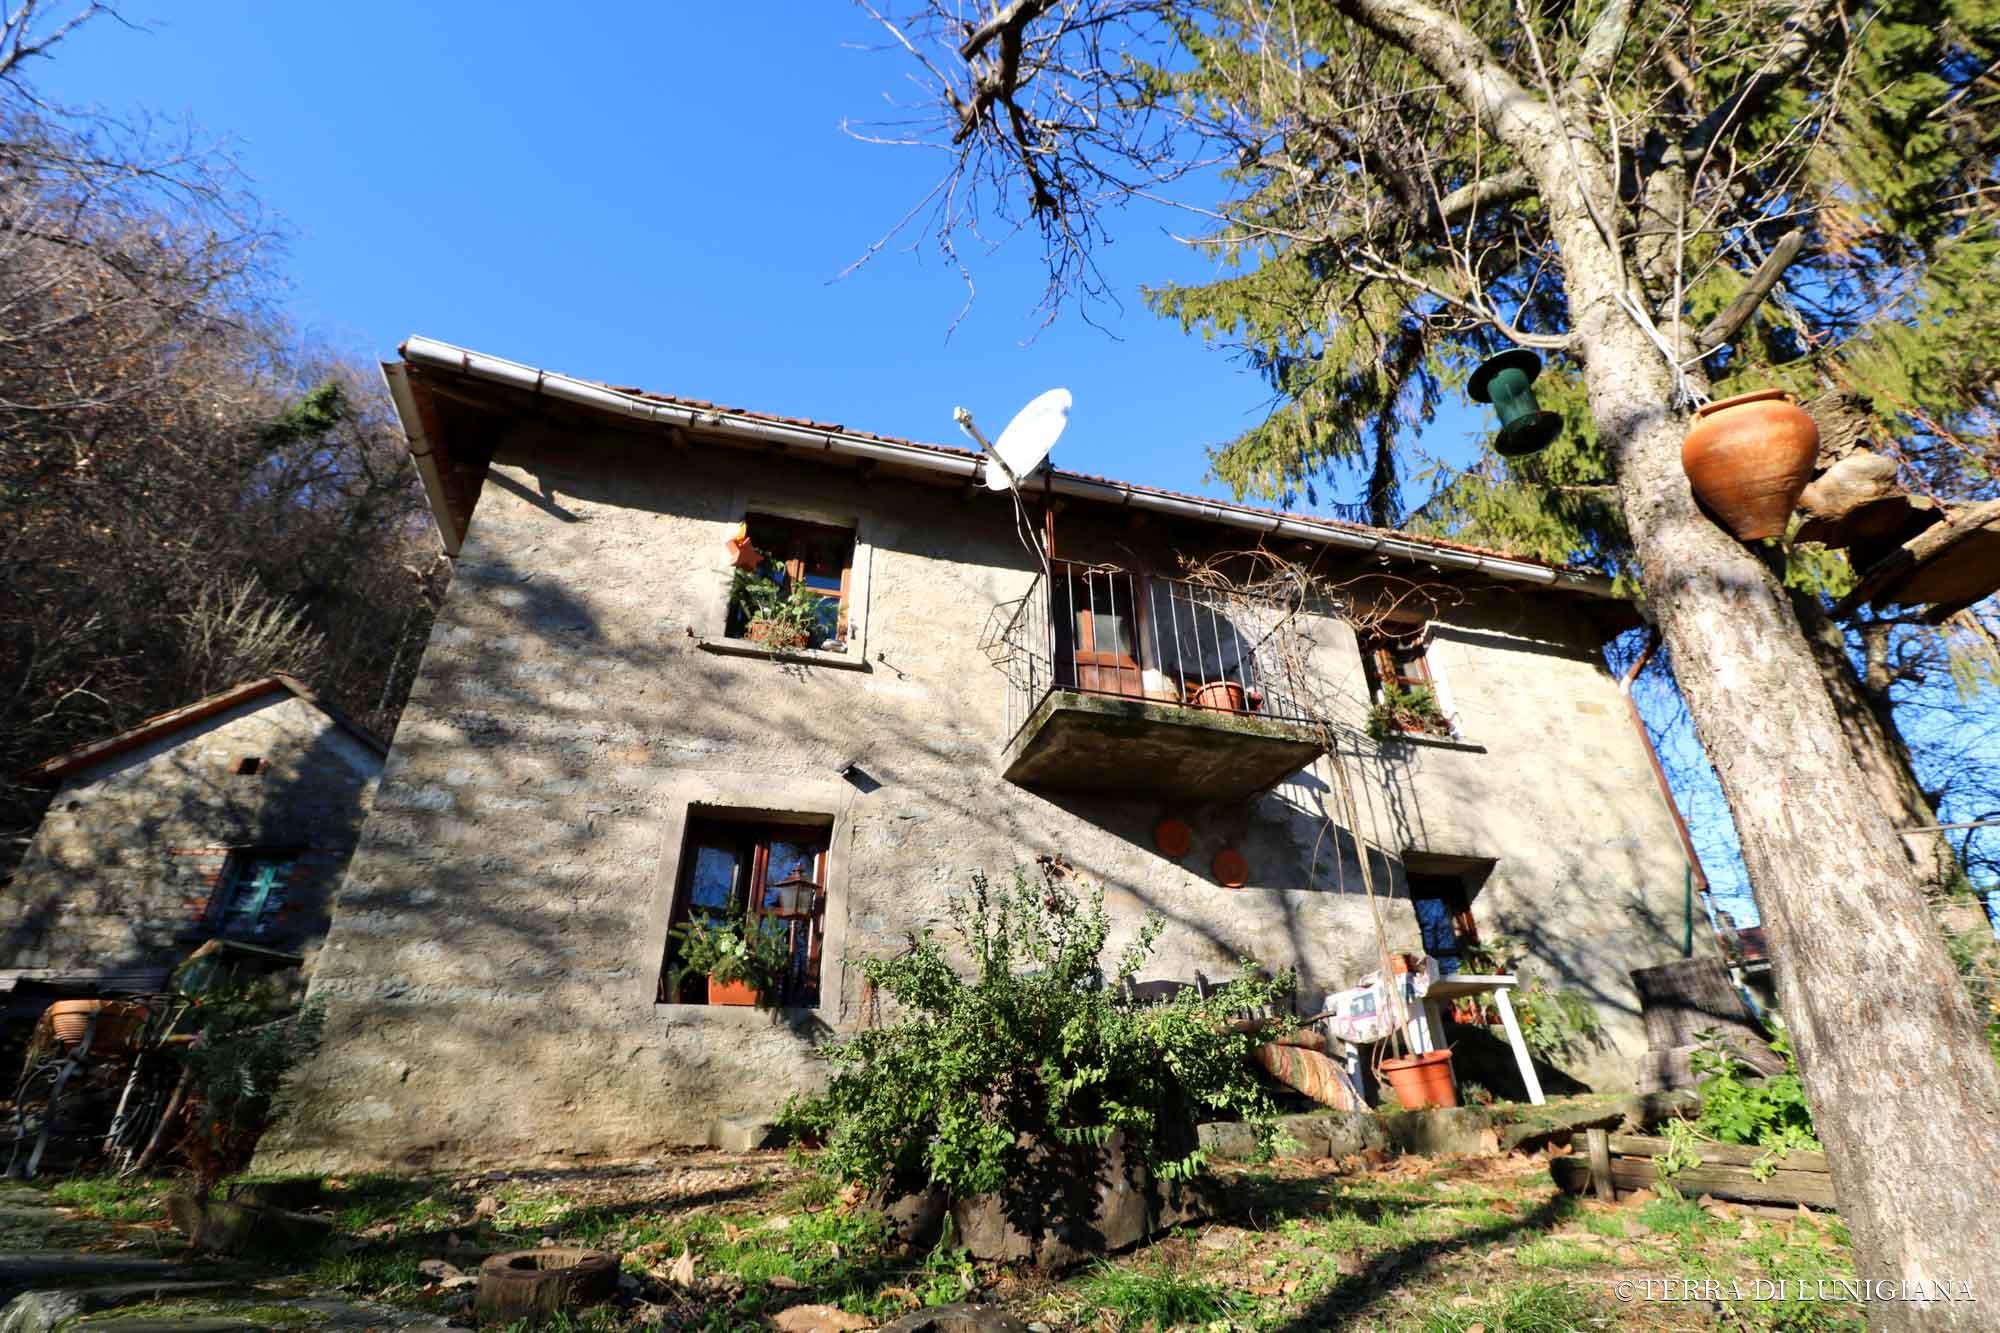 CASA MARIA – Three Stone Houses With Land